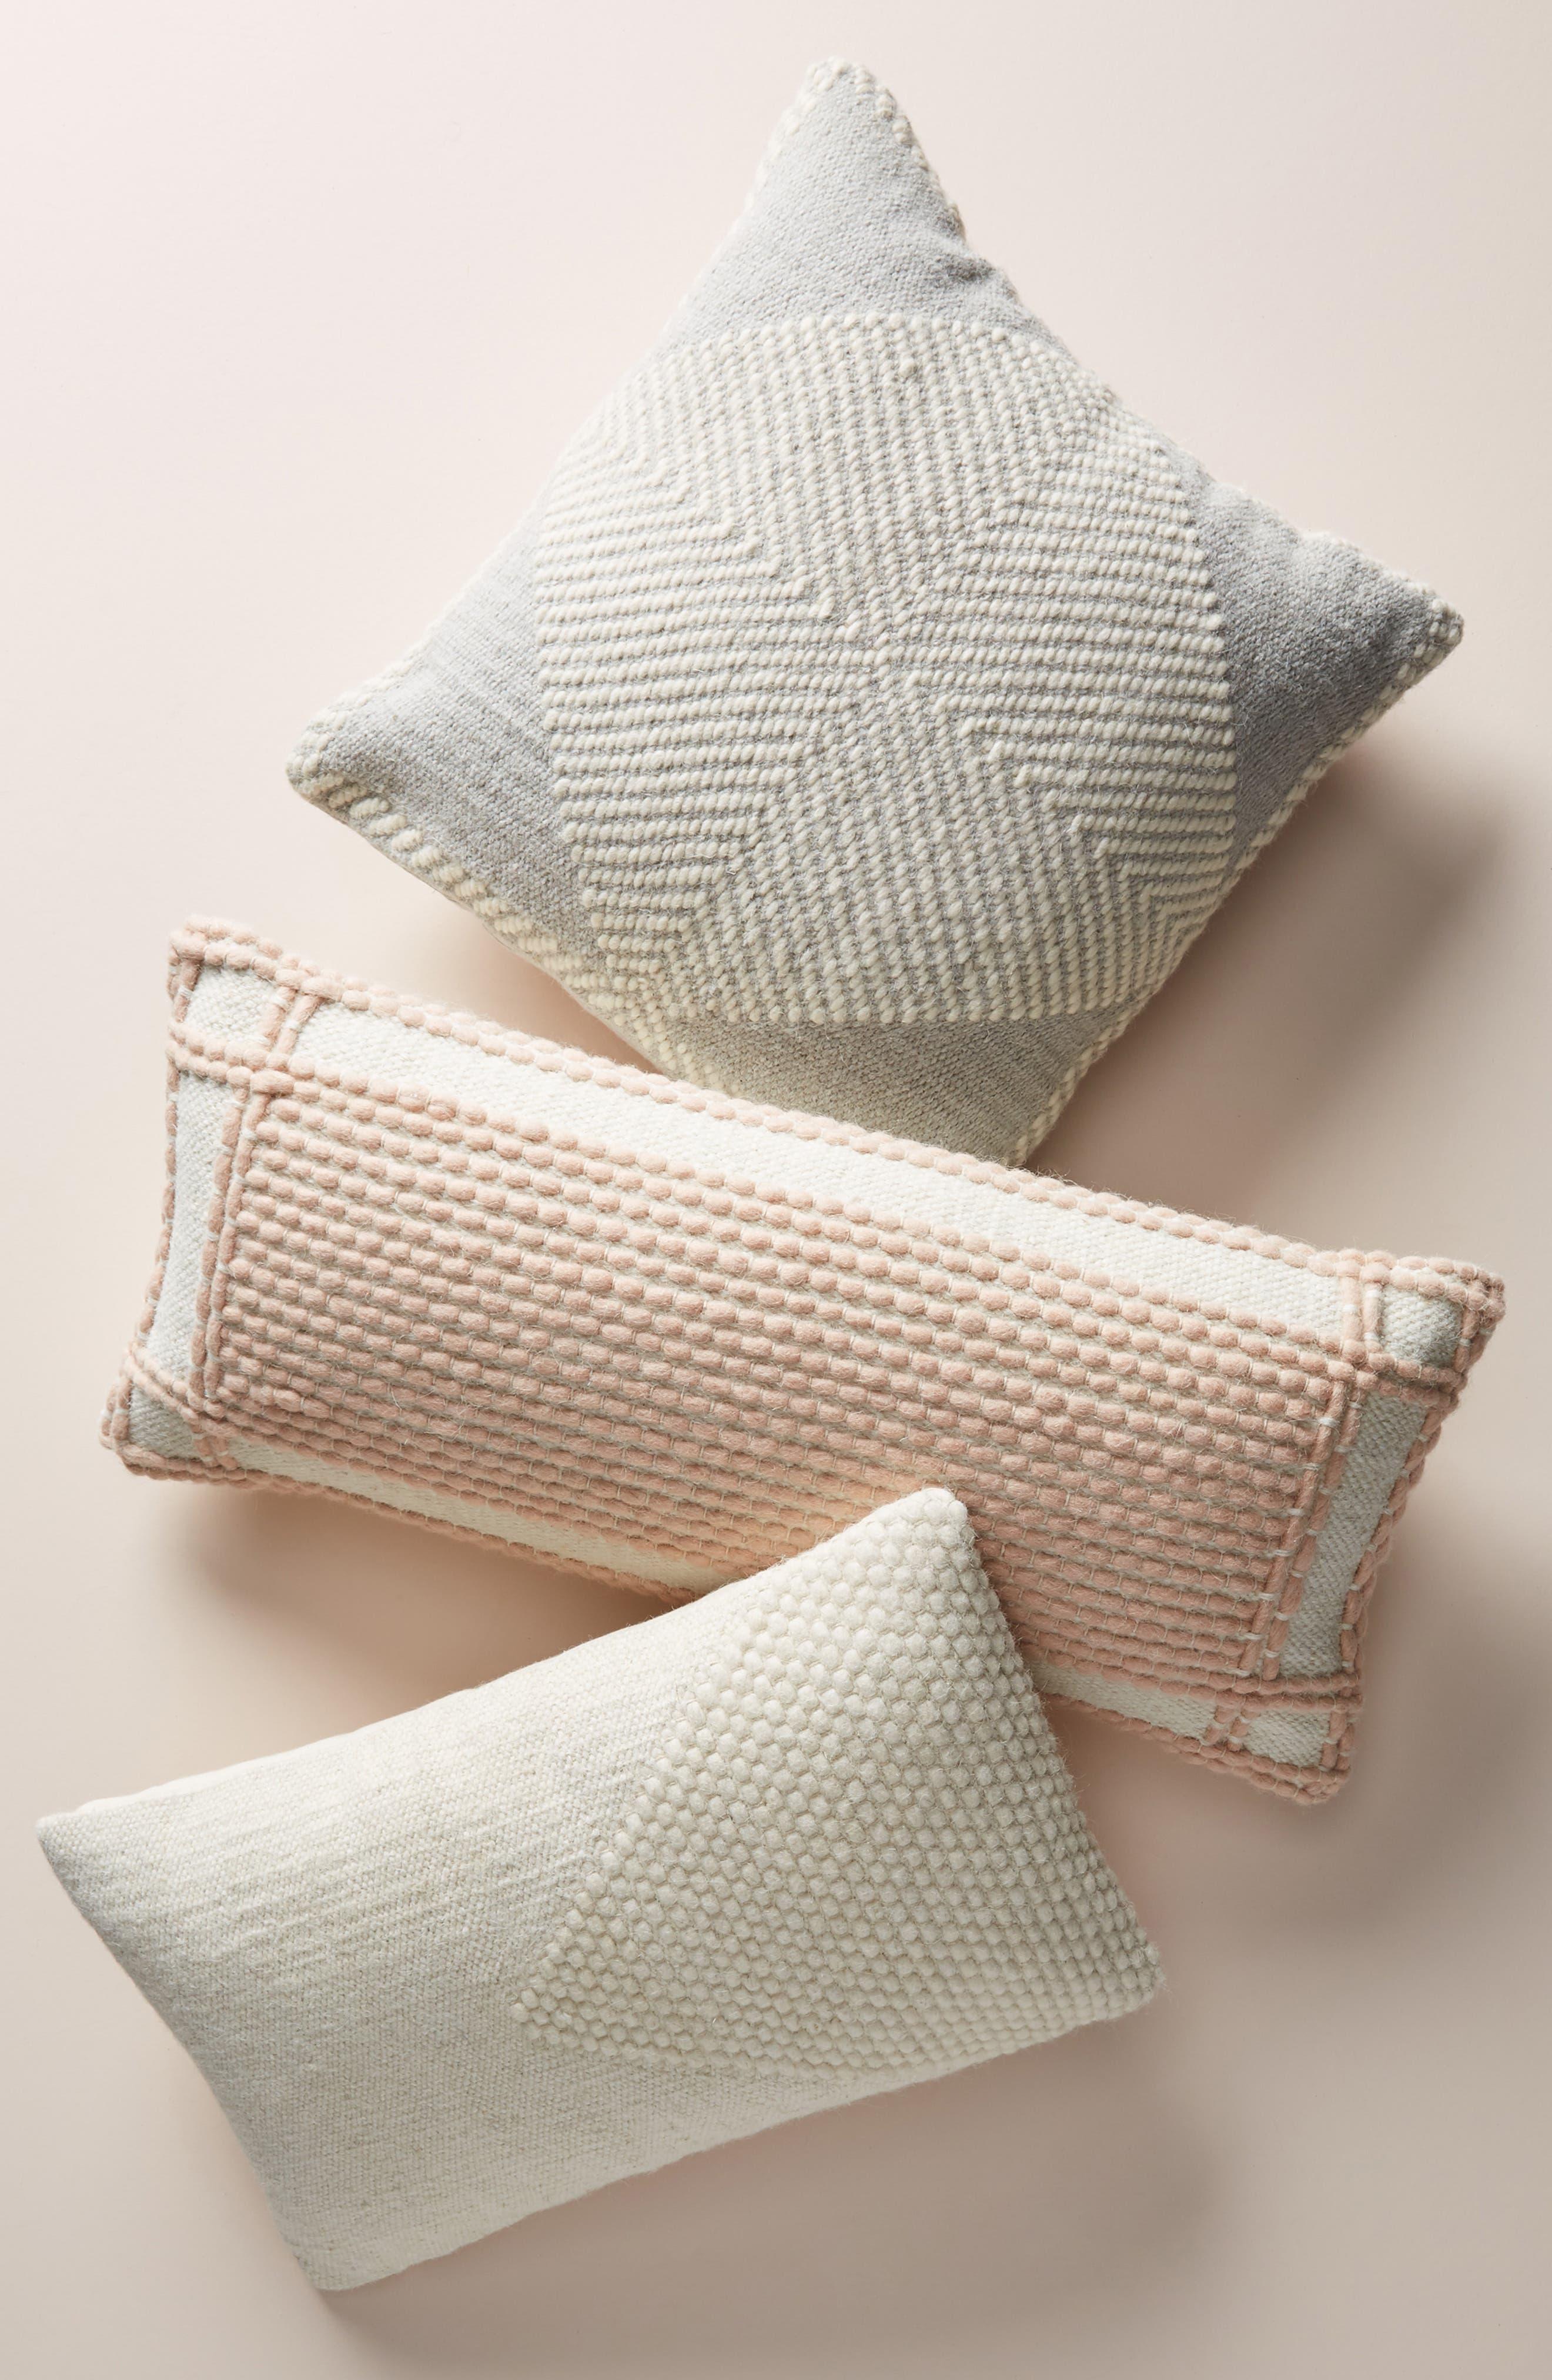 ANTHROPOLOGIE, Evie Bauble Accent Pillow, Alternate thumbnail 4, color, BLUSH